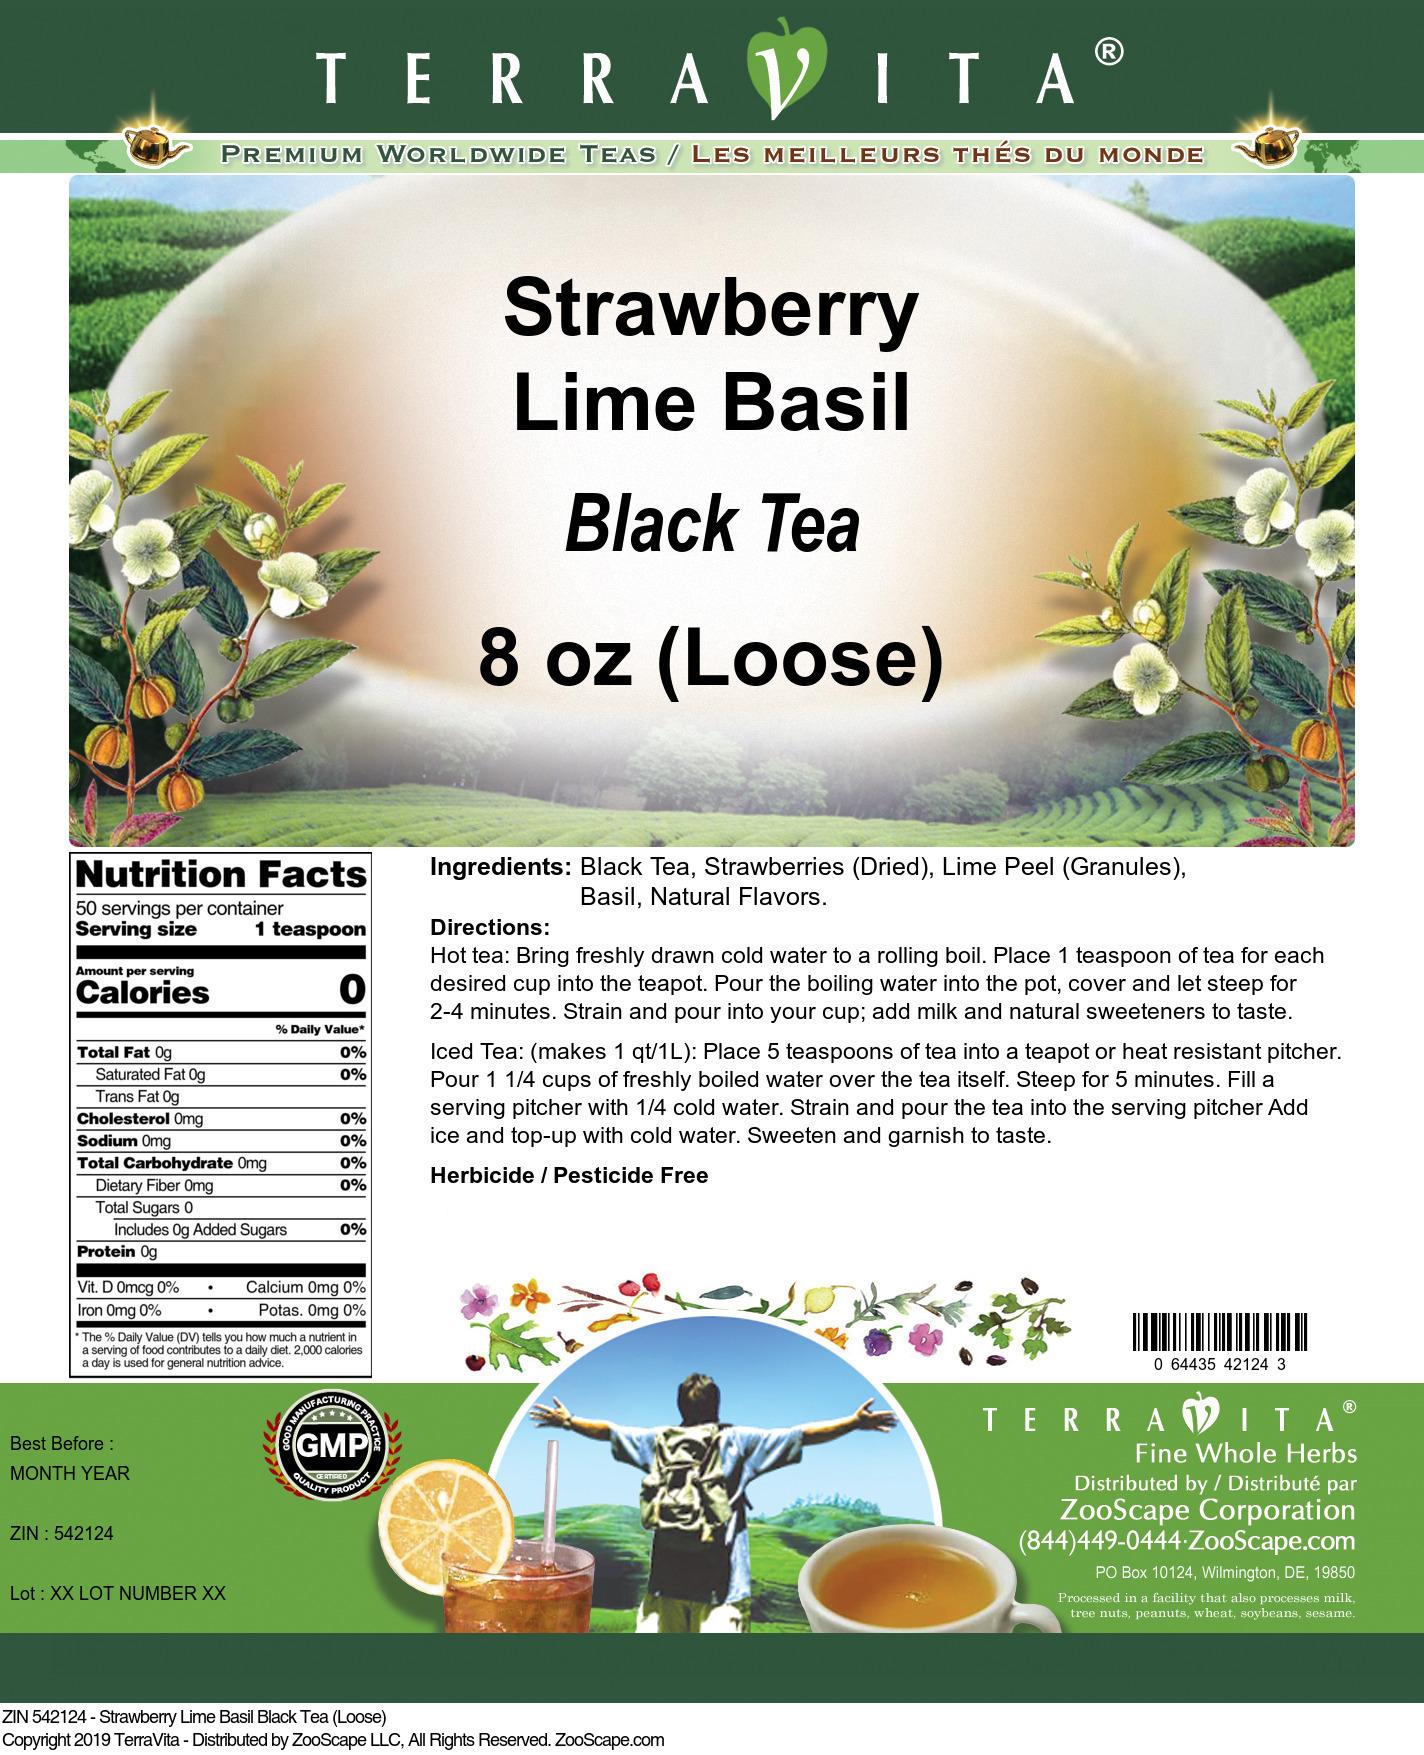 Strawberry Lime Basil Black Tea